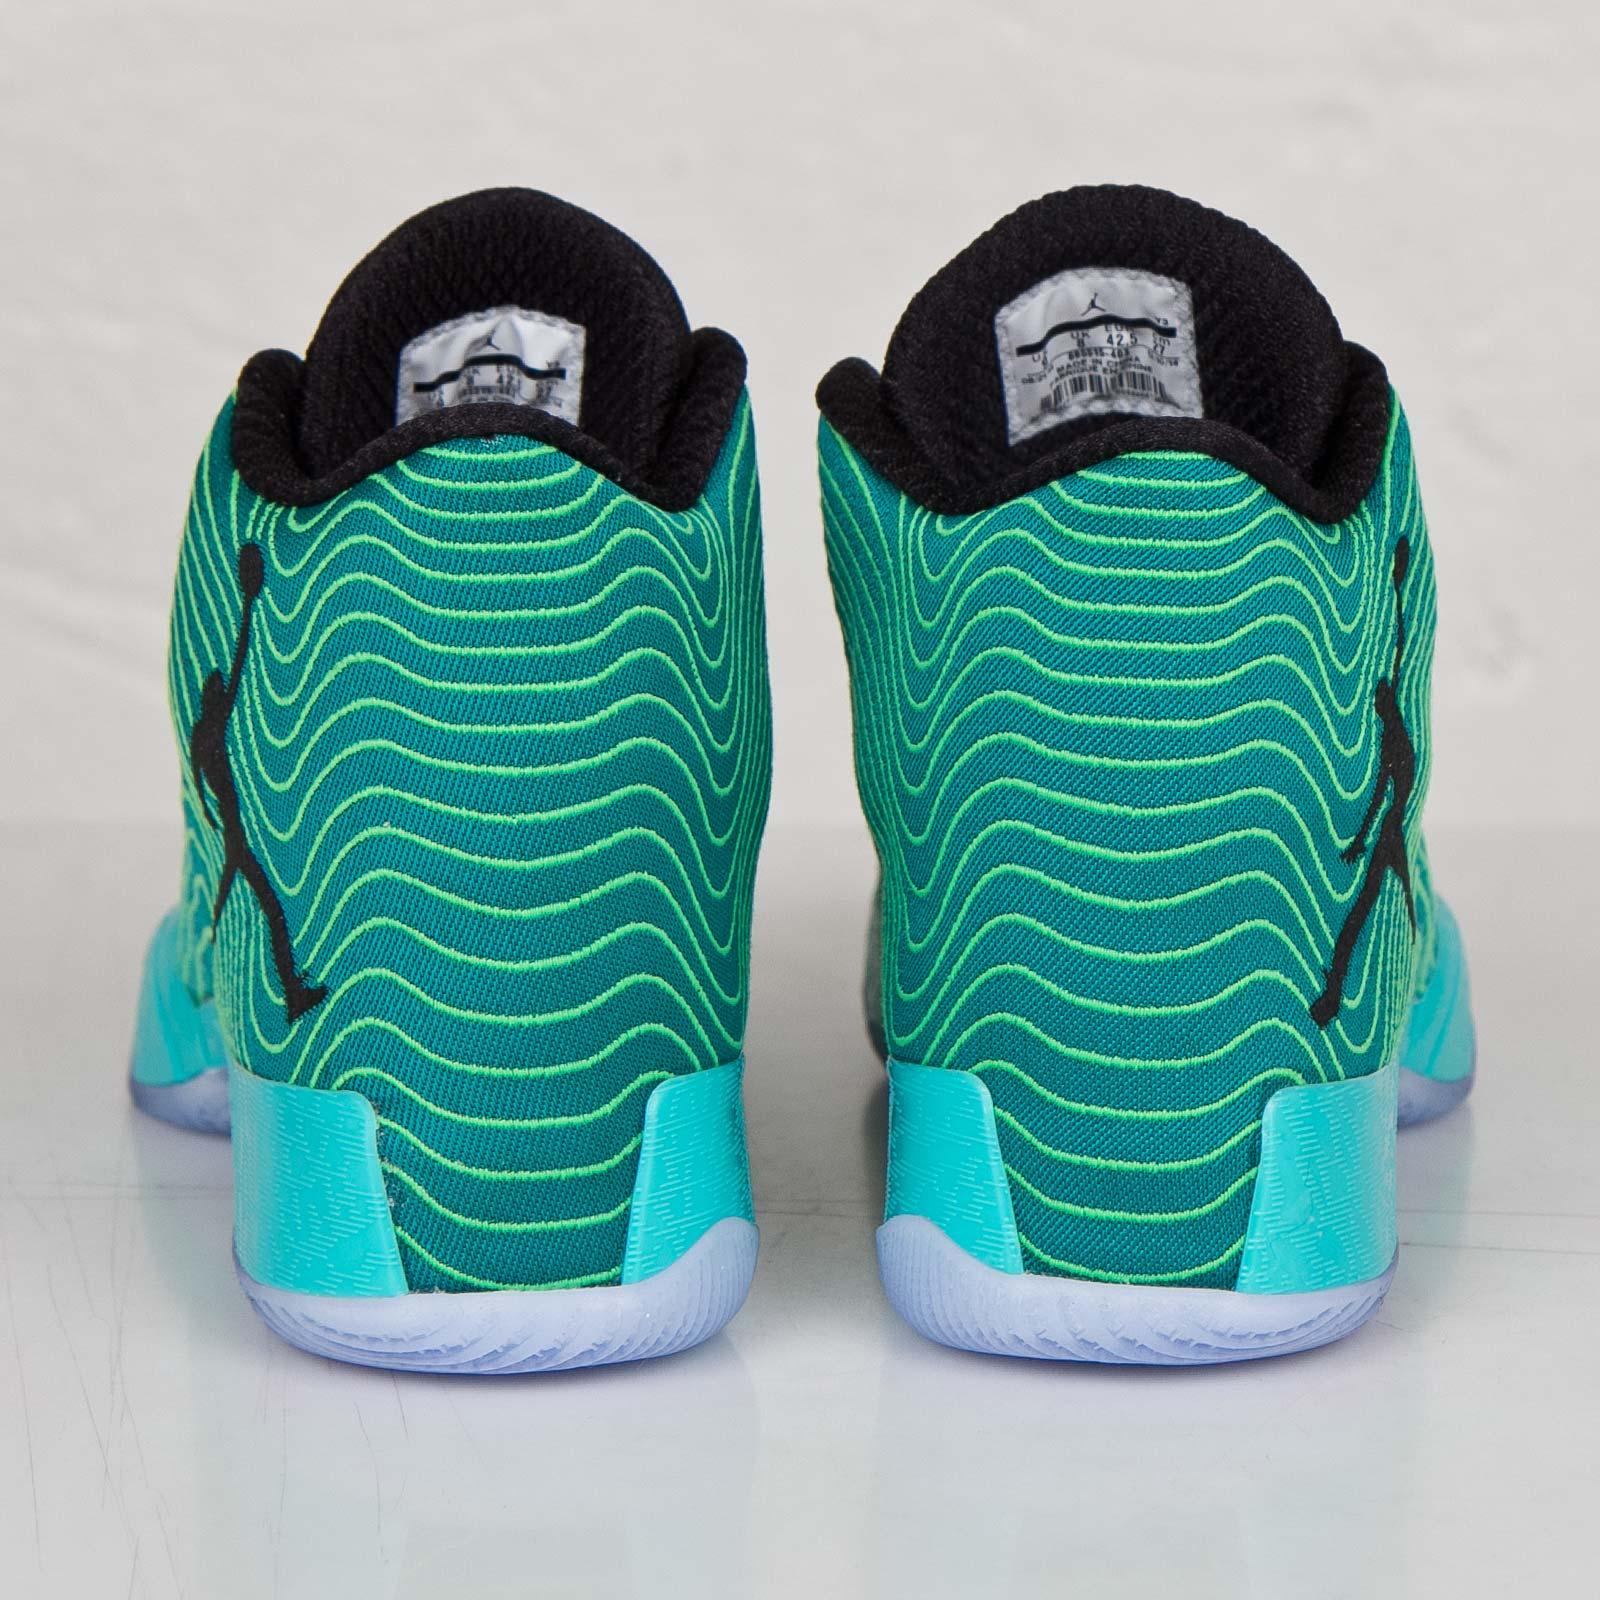 e22c221944de71 Jordan Brand Air Jordan XX9 - 695515-403 - Sneakersnstuff